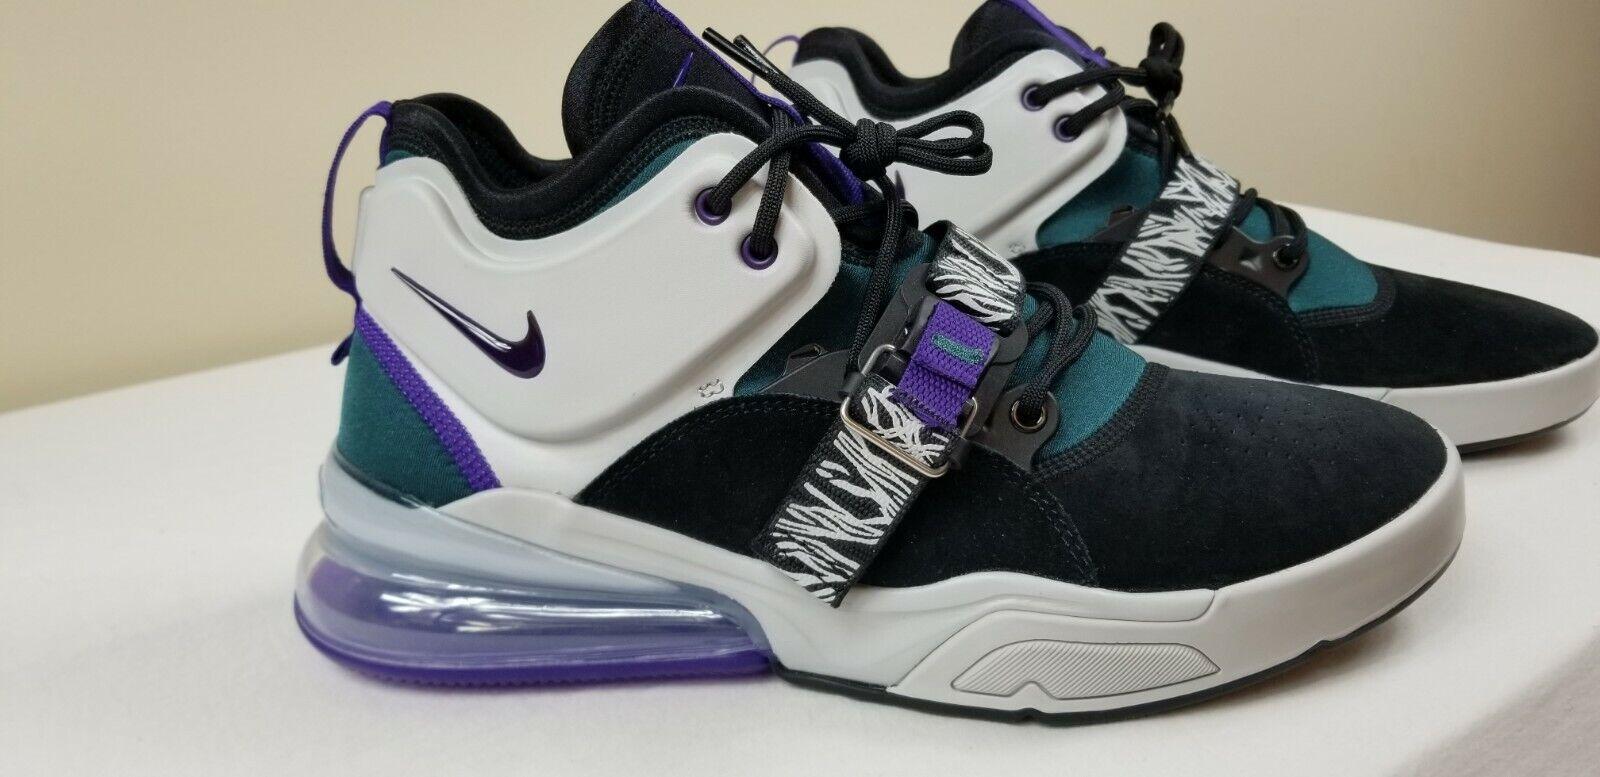 Nike Air Force 270  Carnivore  Black Court Purple Teal AH6772-005 Men's Sz 10.5